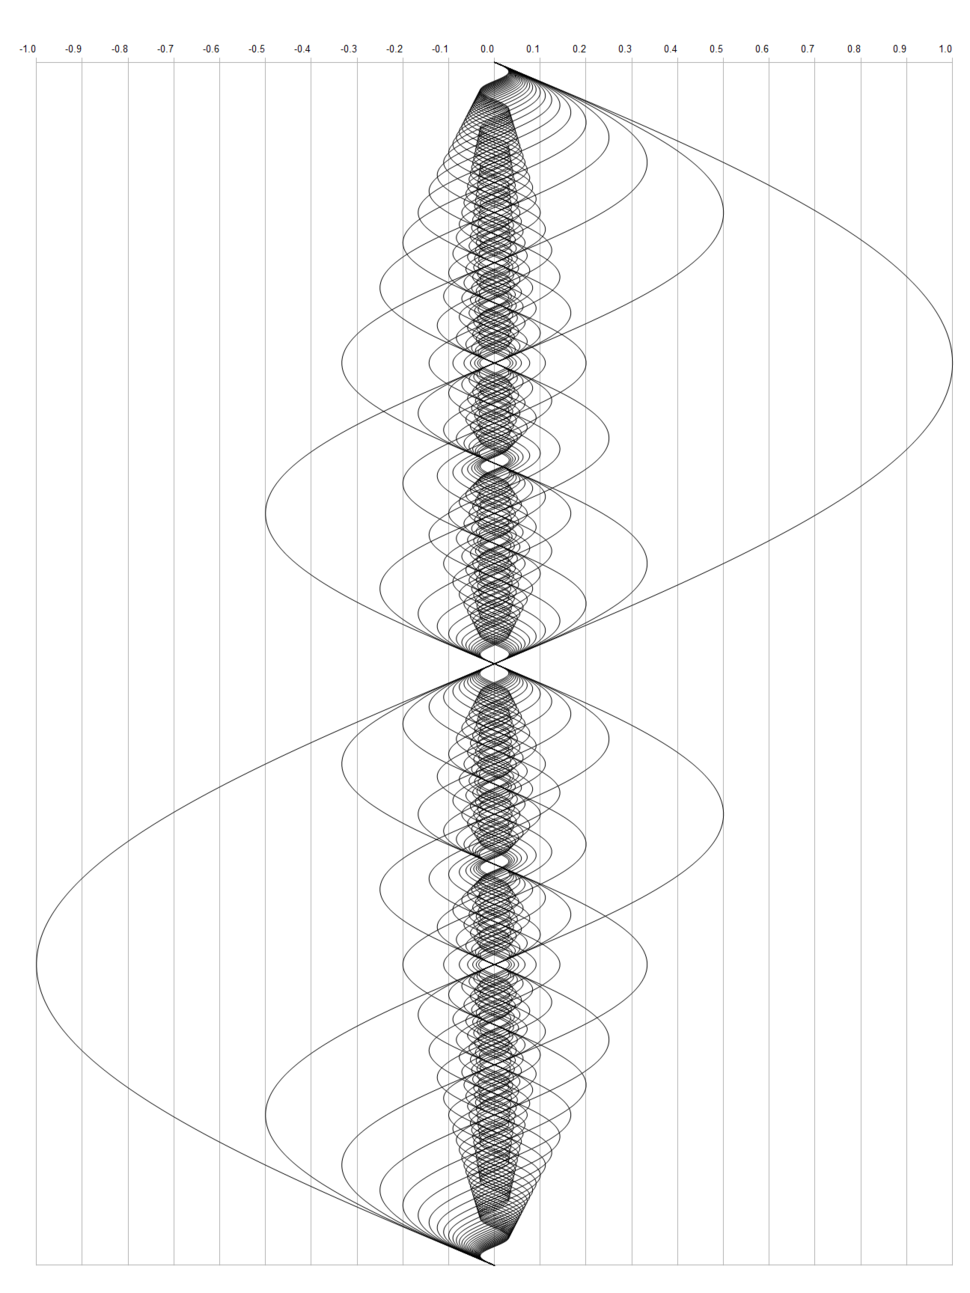 Harmonic series to 32